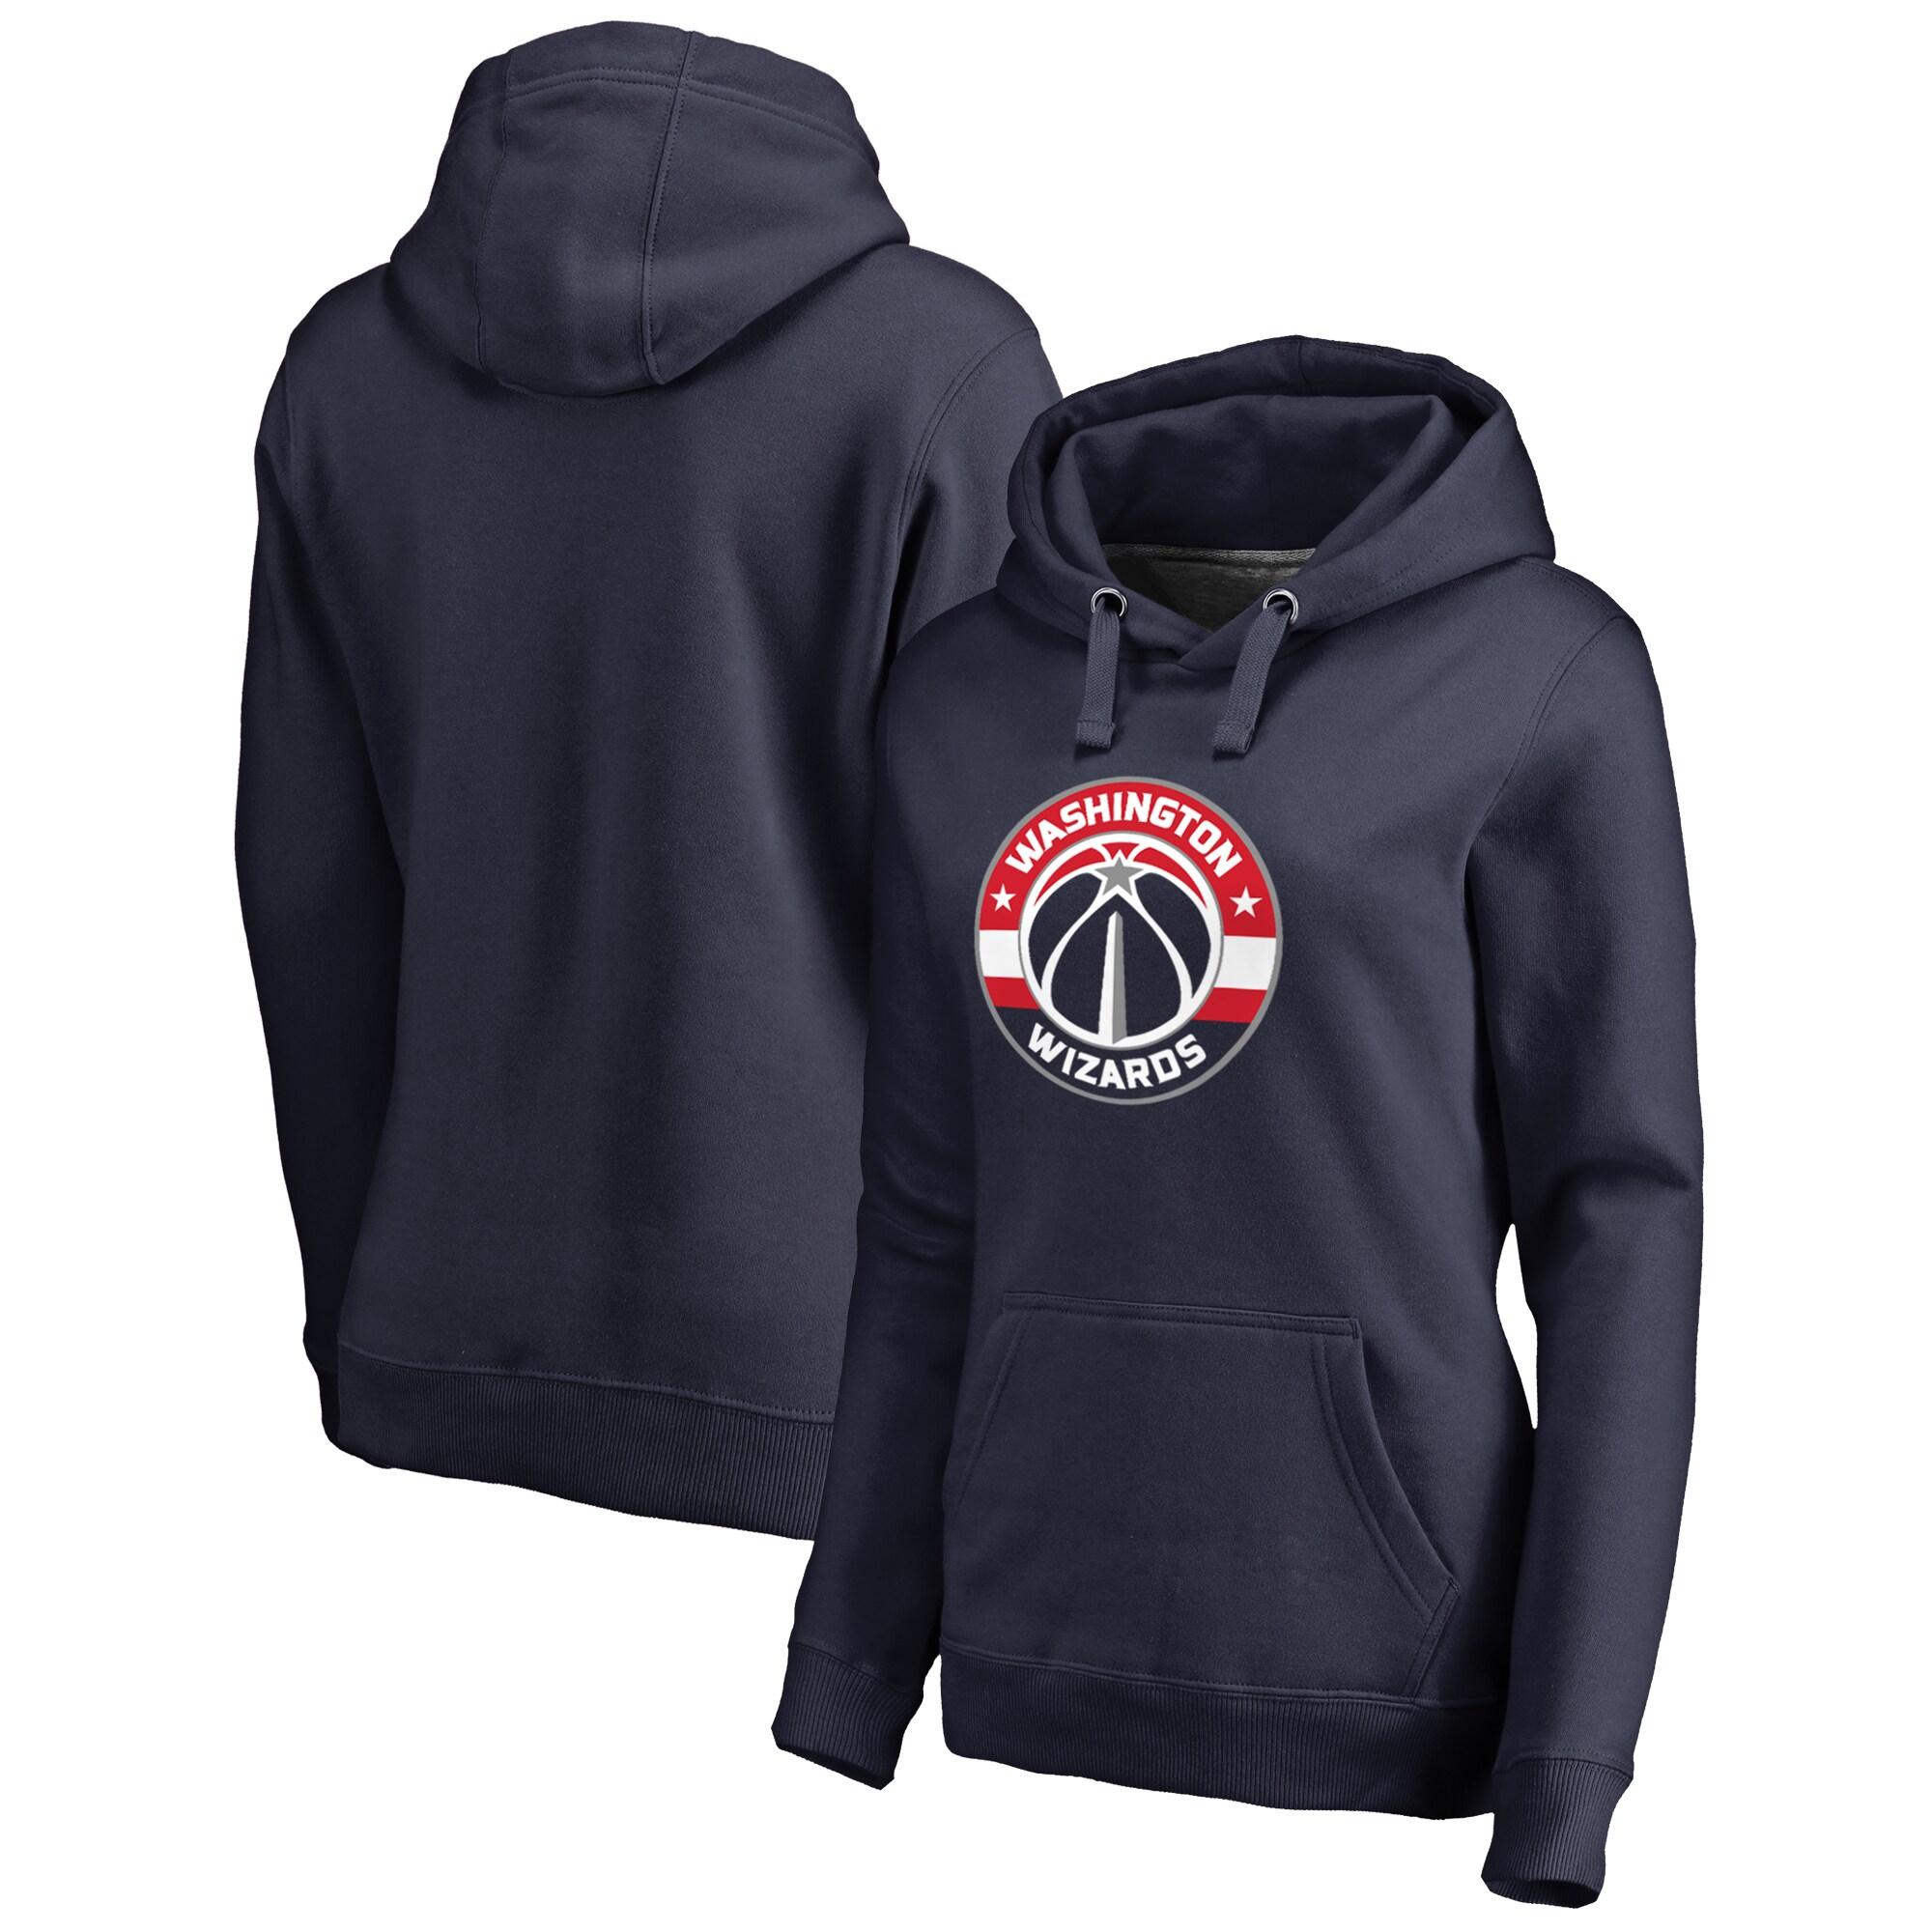 Washington Wizards Fanatics Branded Women's Primary Logo Pullover Hoodie - Navy